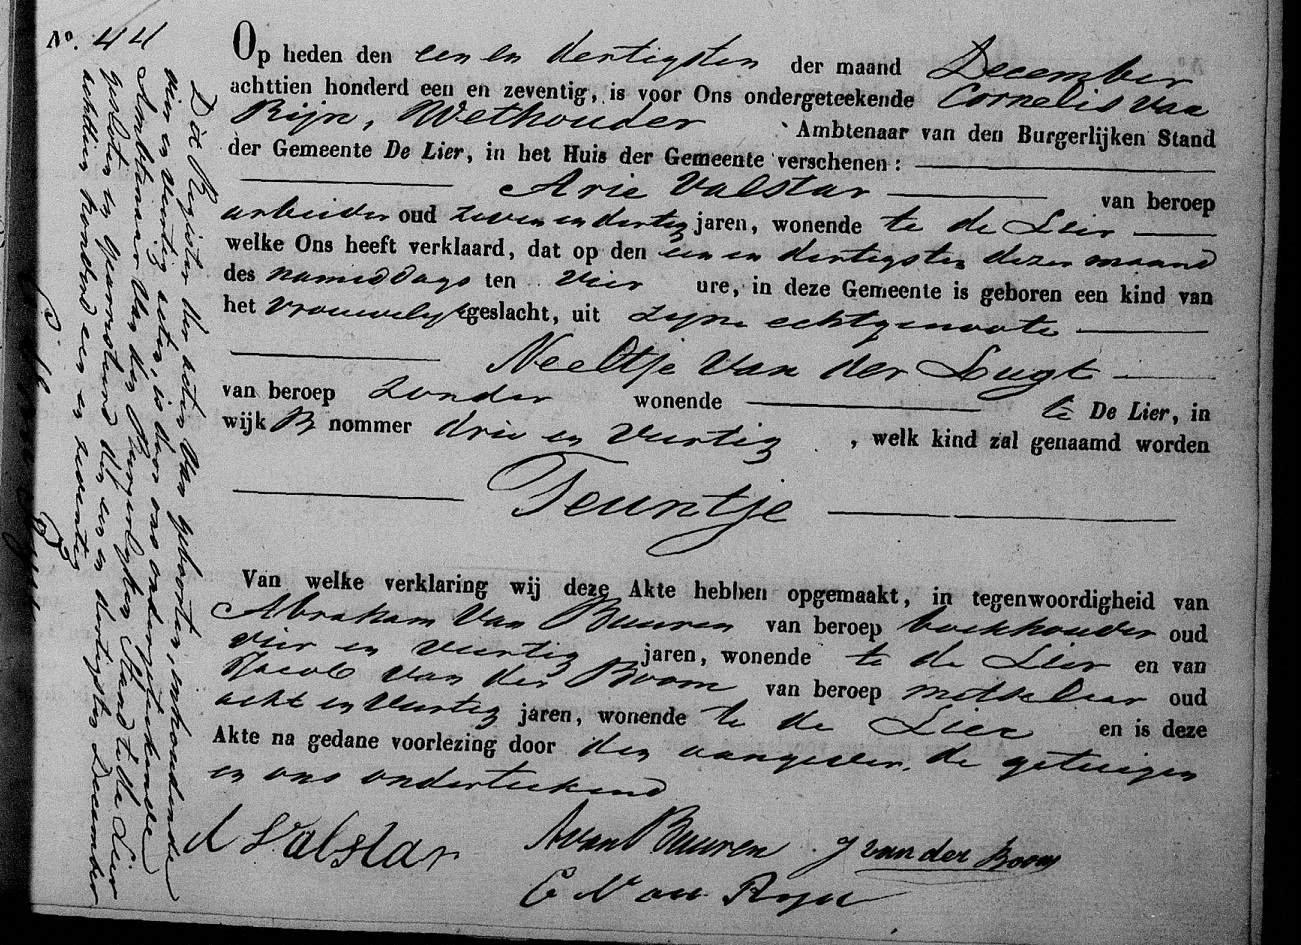 1871-12-31 Geboorte akte Teuntje Valstar